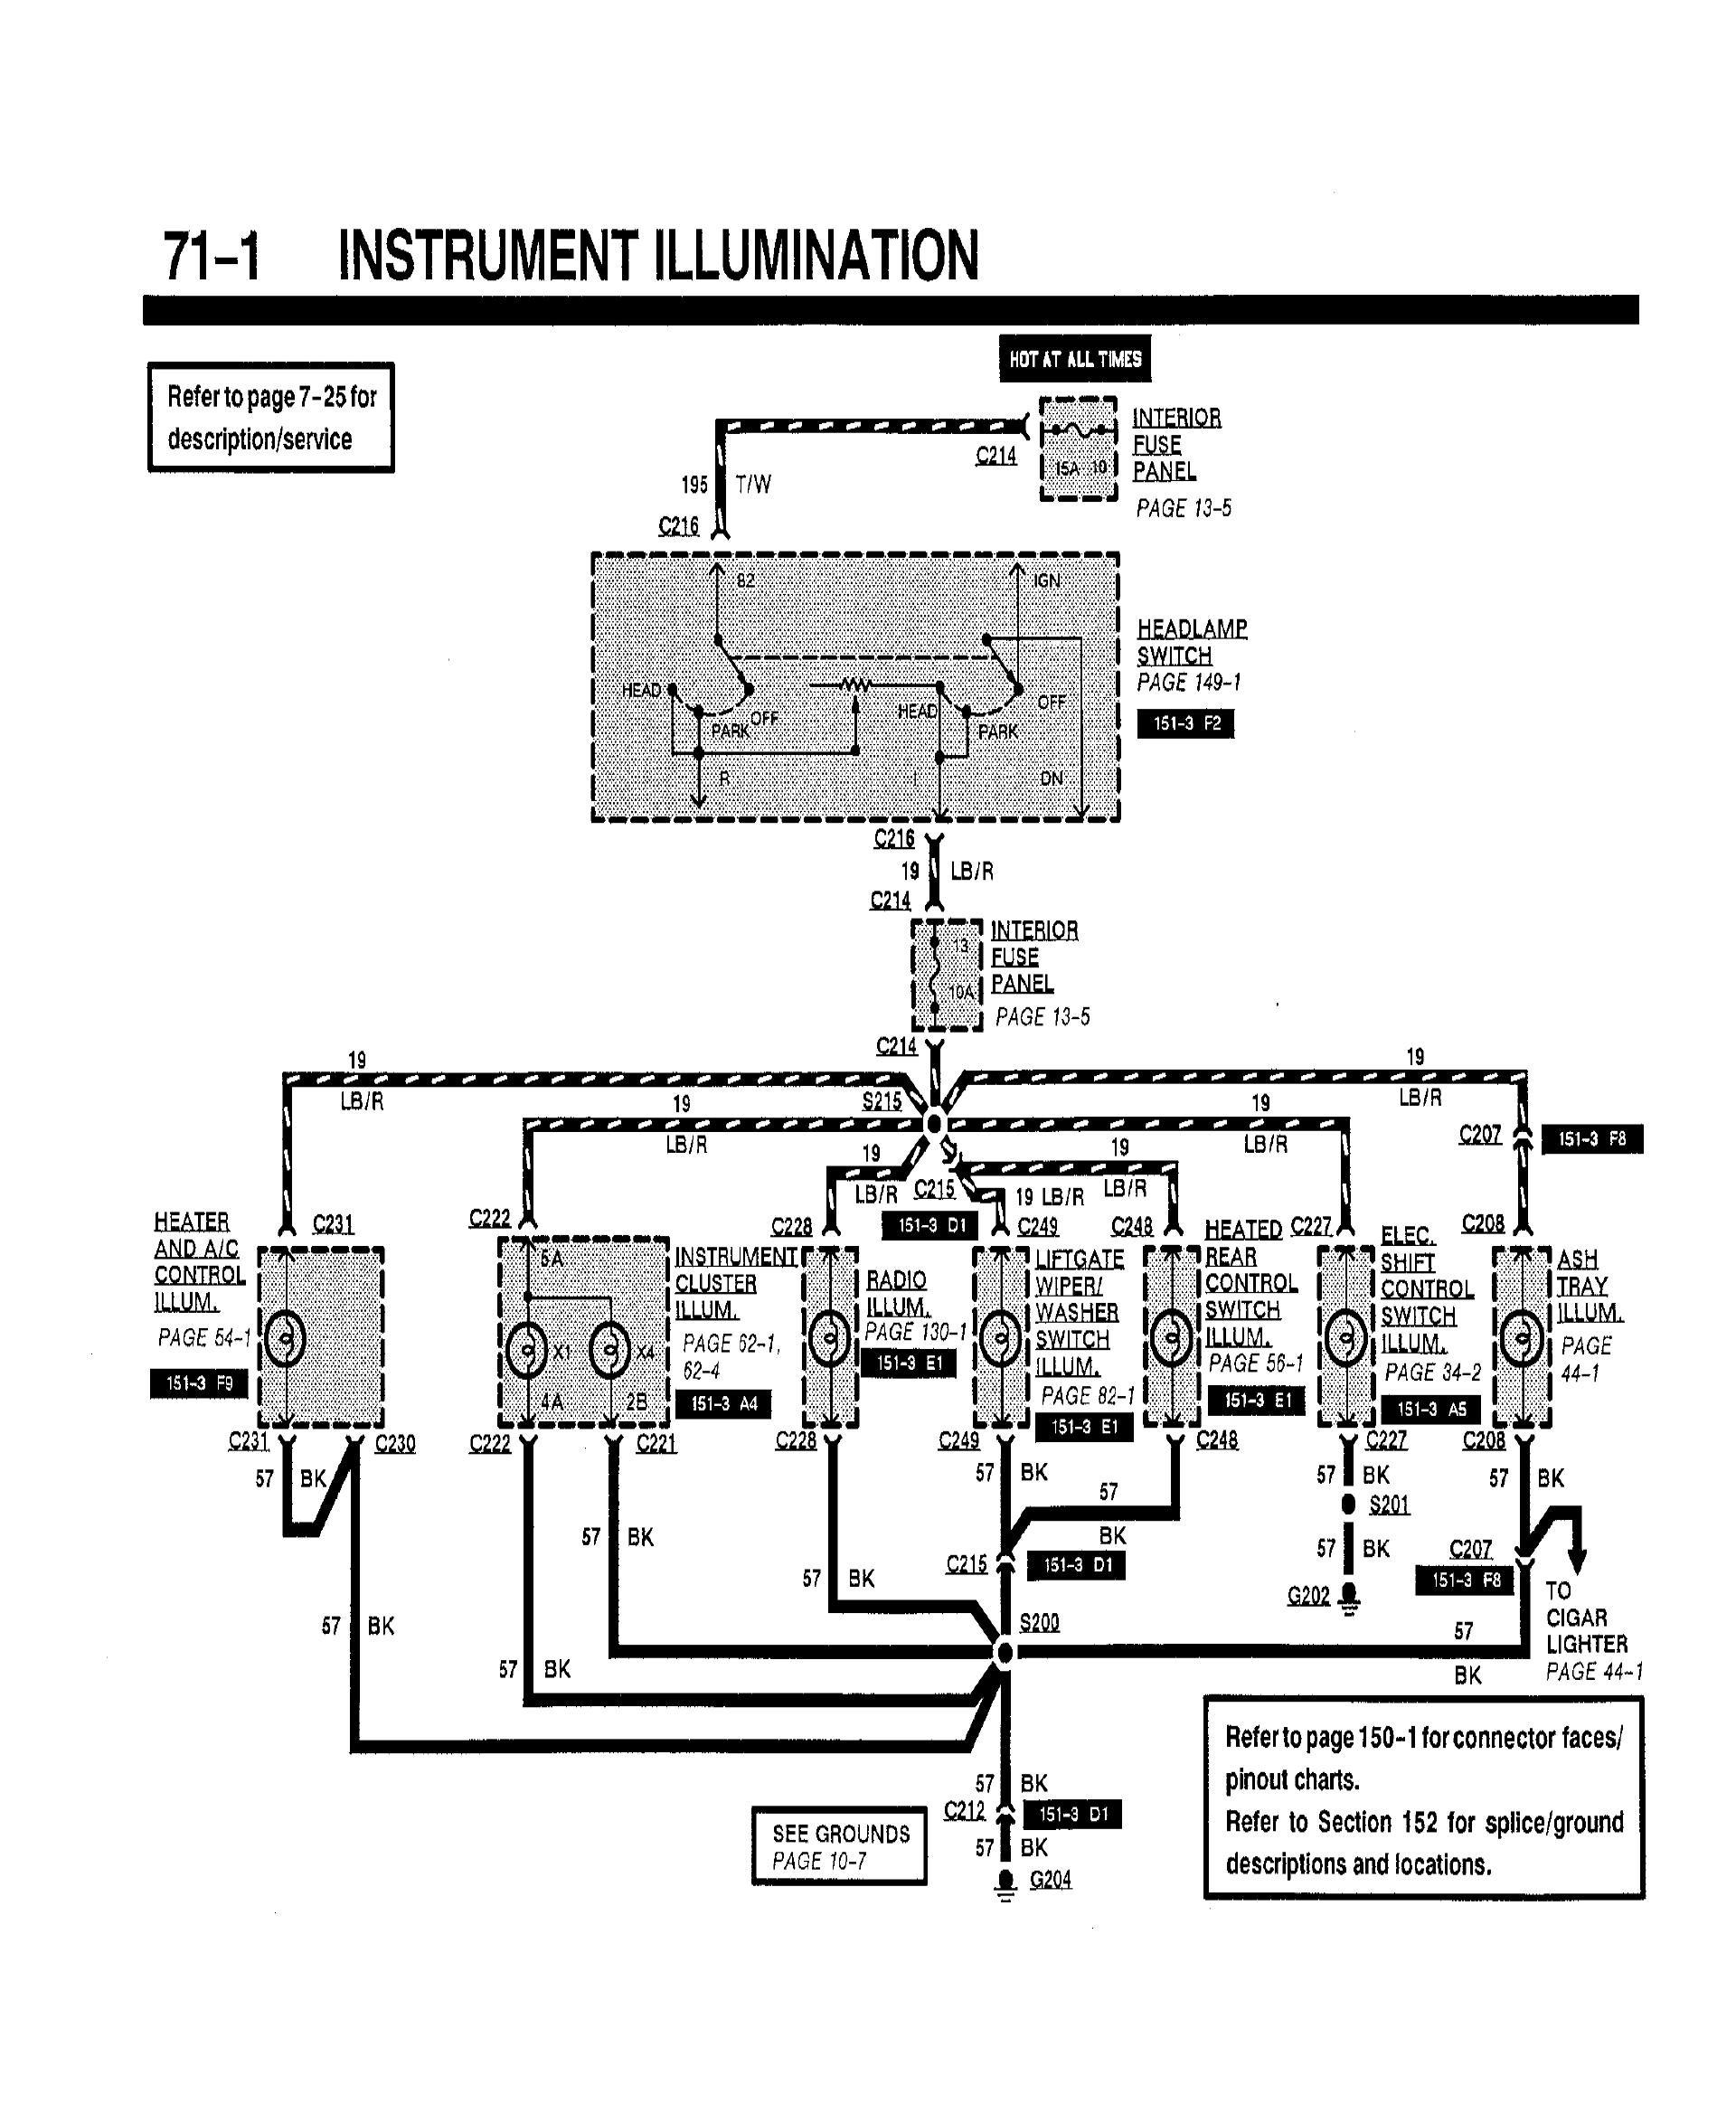 1998 ford Explorer Engine Diagram solved Exterior Fusebox Diagram for A 2007 ford Explorer Fixya Of 1998 ford Explorer Engine Diagram